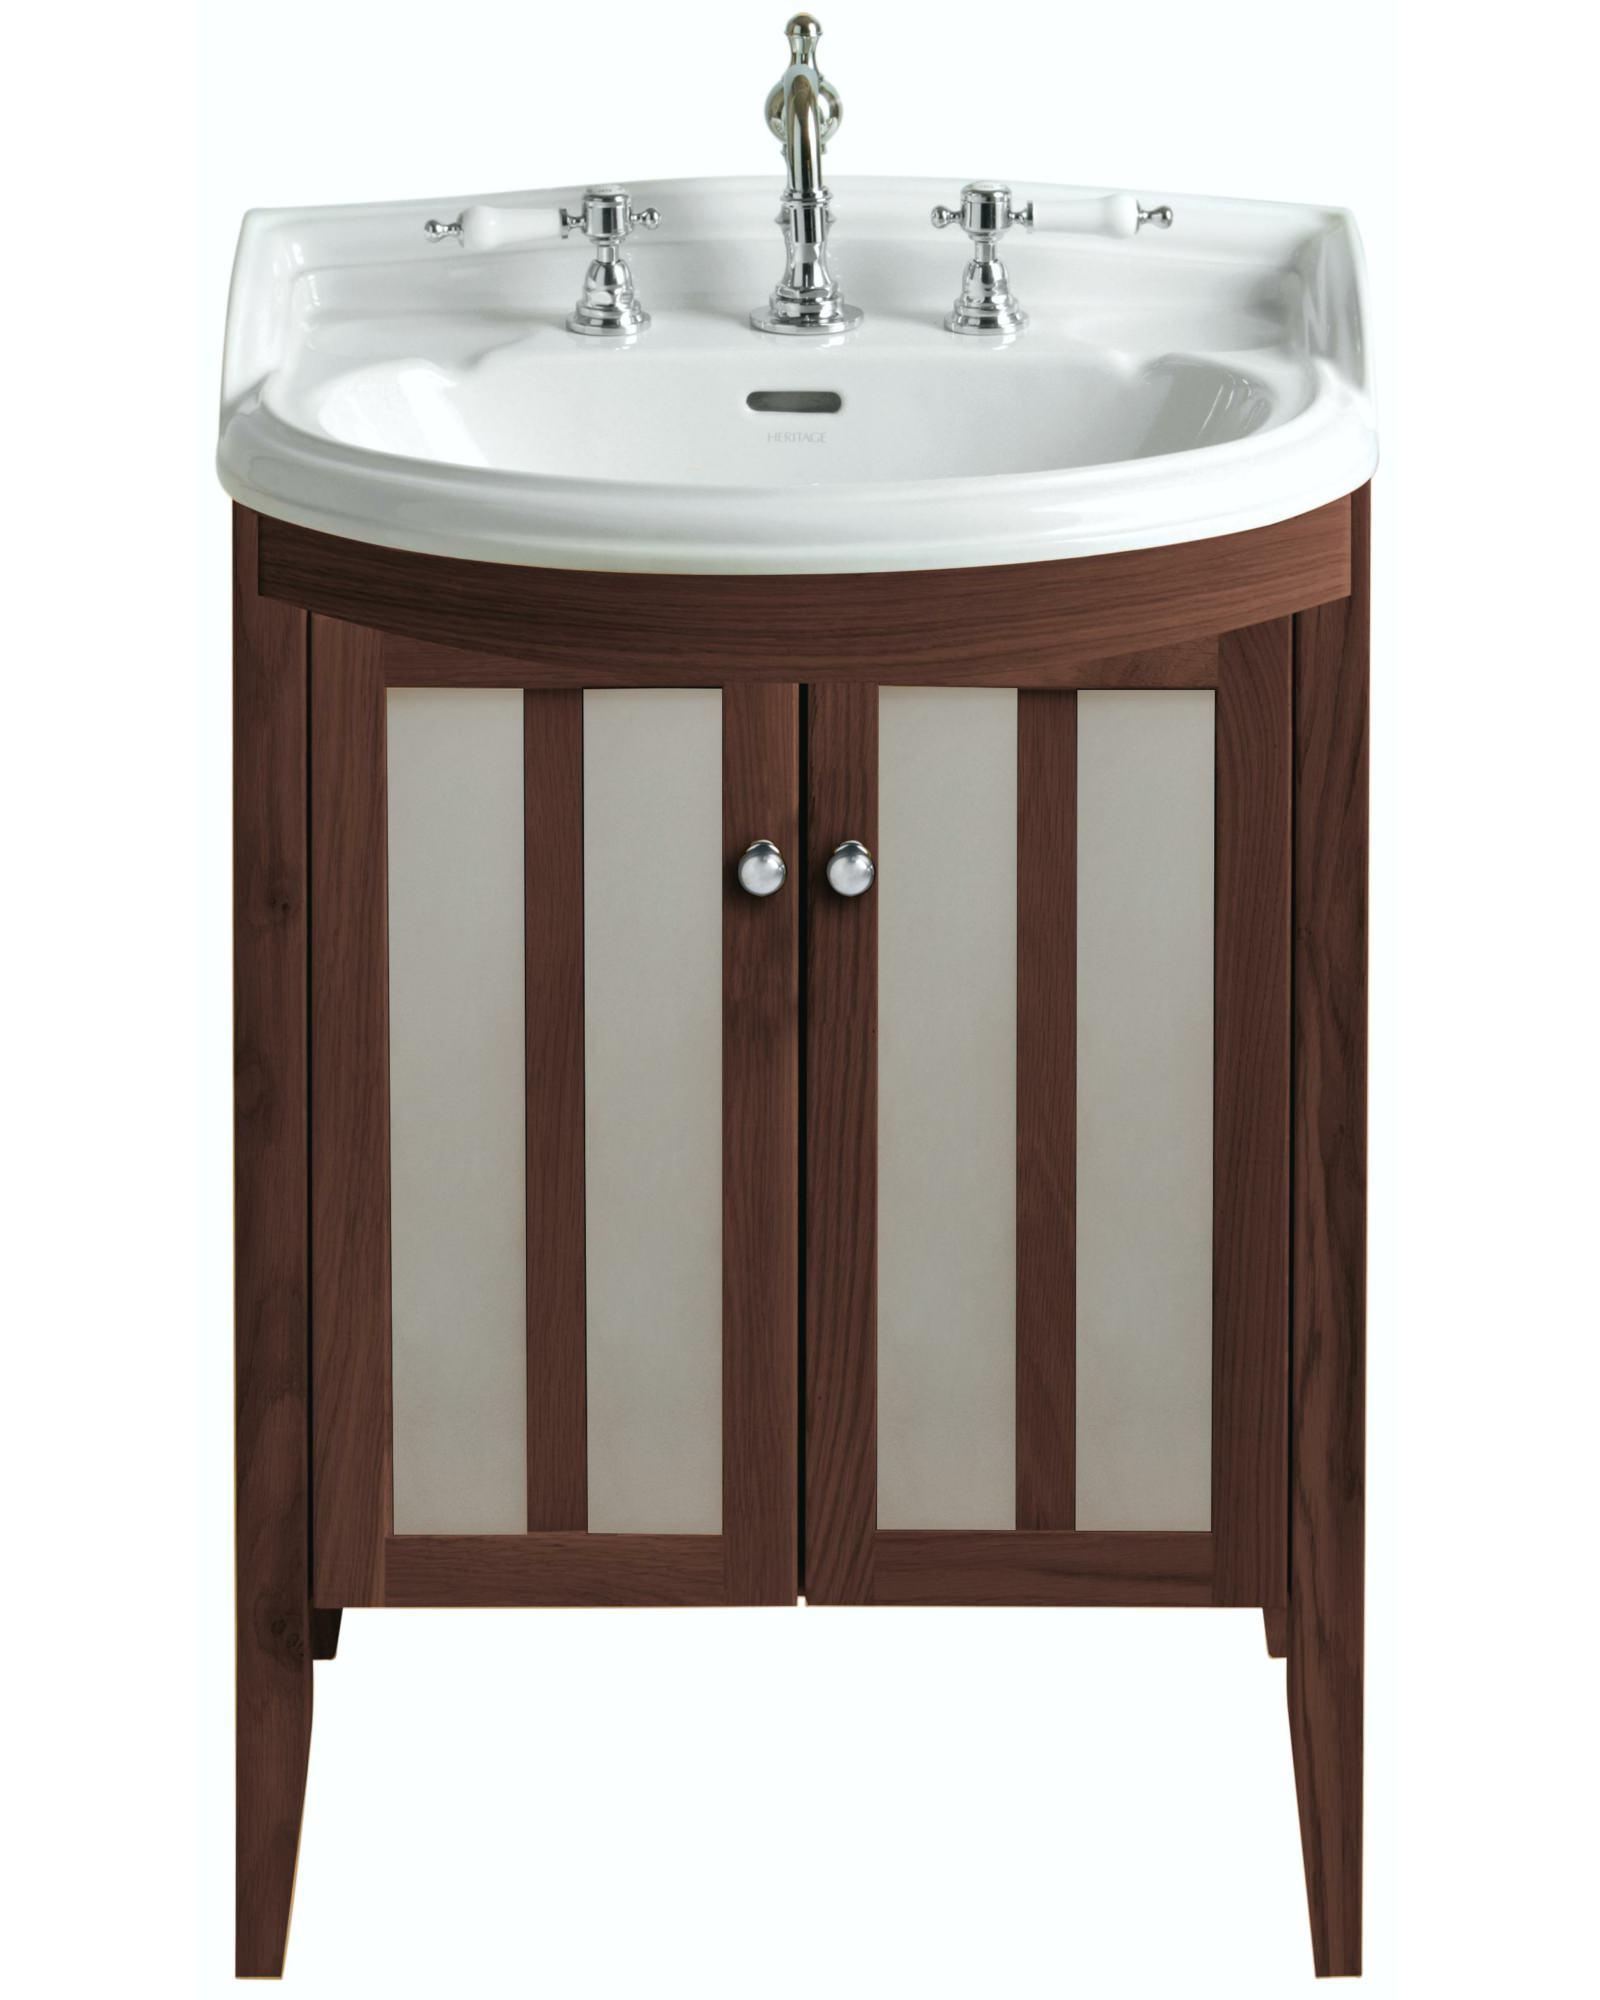 Heritage Bathroom Vanity: Heritage Hidcote Freestanding Bowfront Medium Walnut